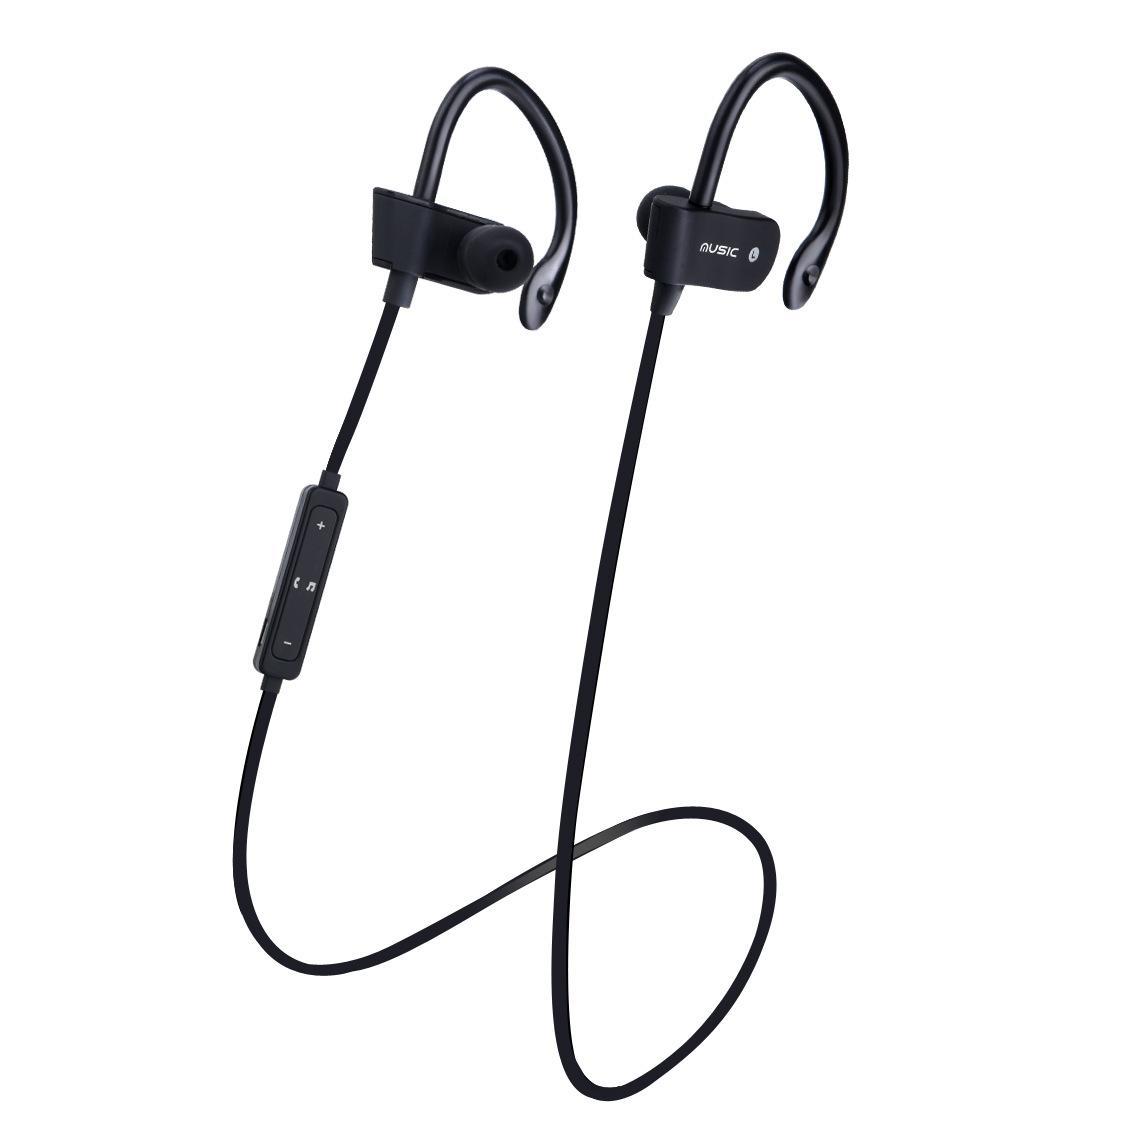 Hongsund Wireless Bluetooth 41 Headset Earphone Stereo Bass Music Musik Beats S450 Sport Headphone Handsfree With Mic For Ios Android Smartphone Part